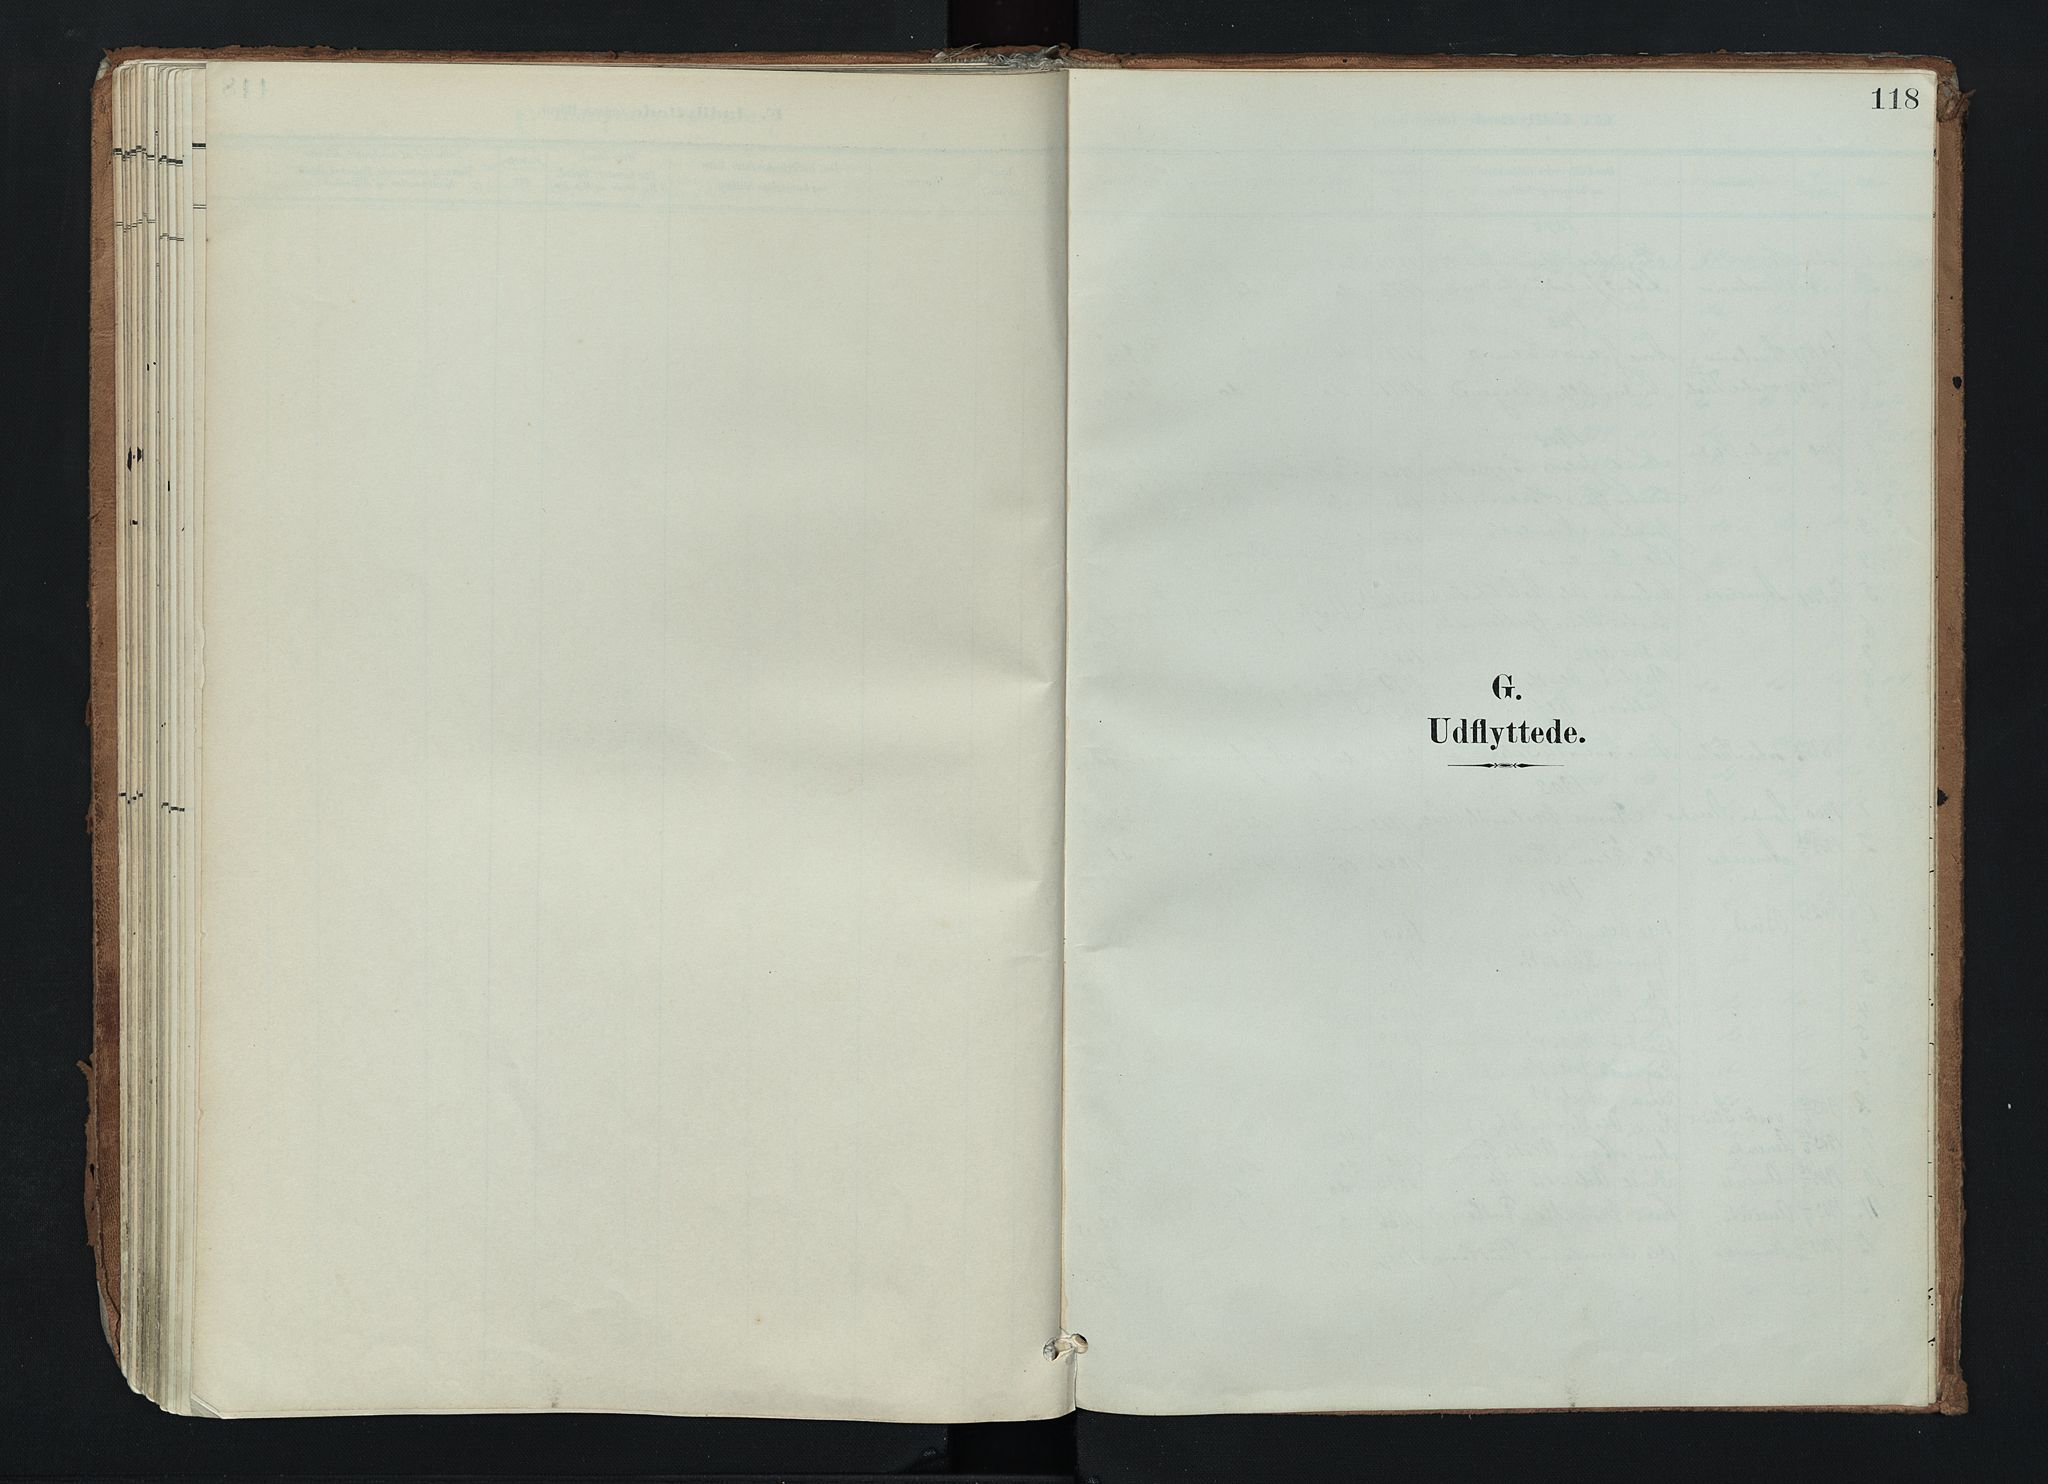 SAH, Nord-Aurdal prestekontor, Ministerialbok nr. 17, 1897-1926, s. 118